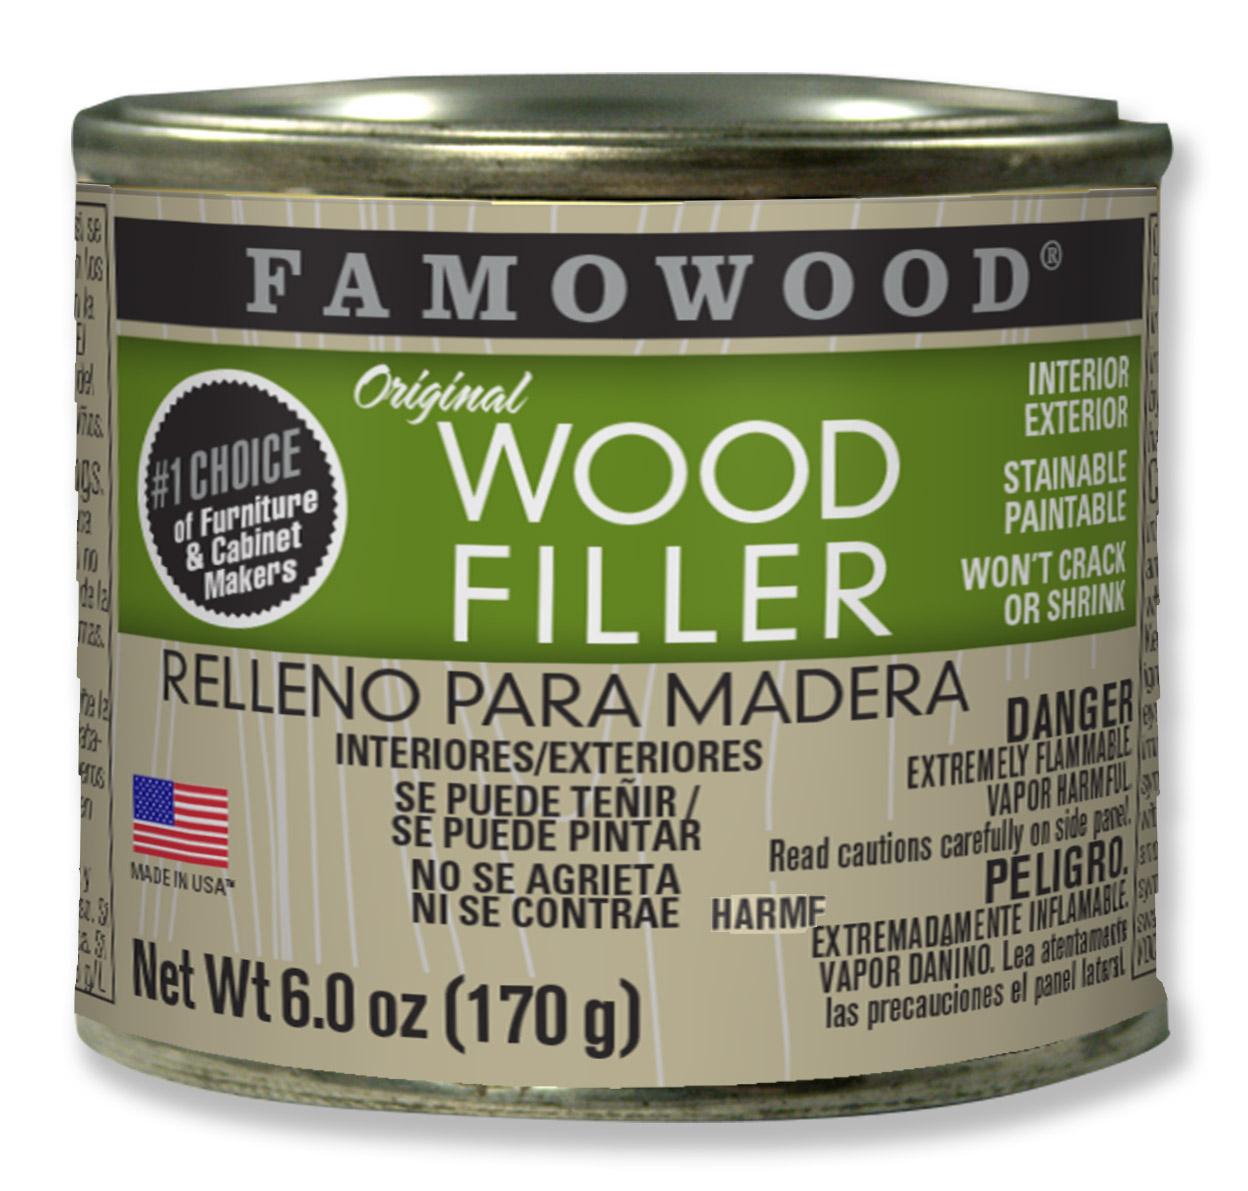 Teal Home Exterior Wood Filler Bondo Exterior Wood Filler Siding Famowood Original Wood Filler Net Wt Oz Dpi Us Famowood Original Wood Filler Famowood Products houzz-02 Exterior Wood Filler